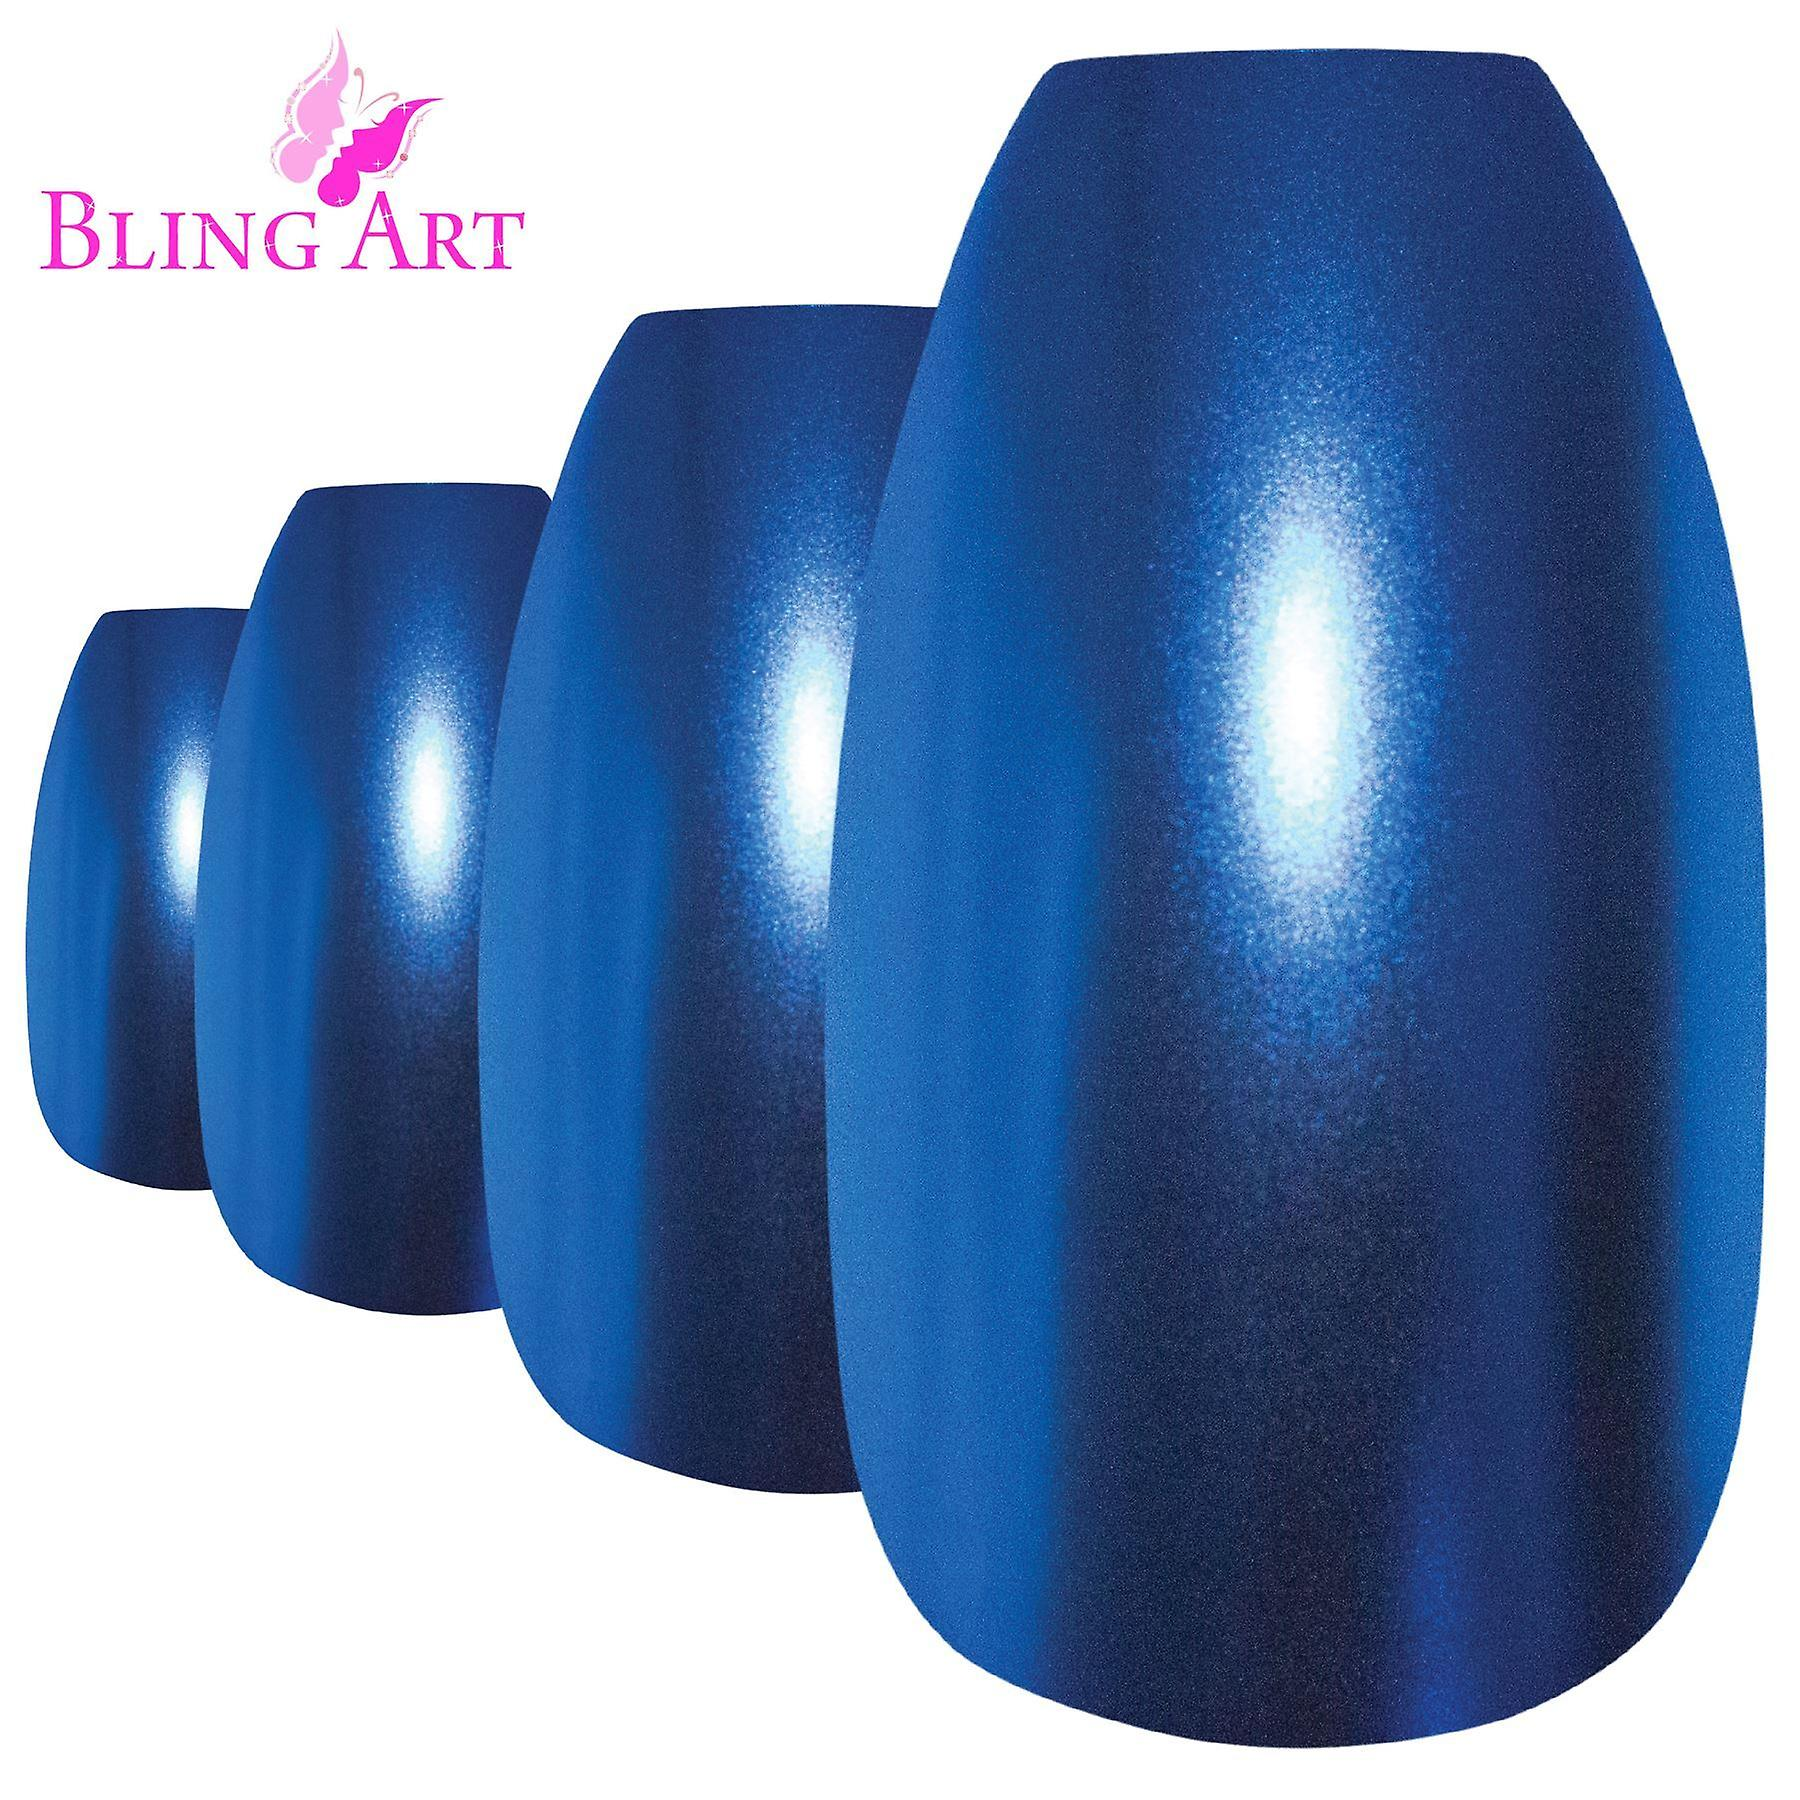 False nails by bling art blue matte metallic ballerina coffin fake acrylic tips